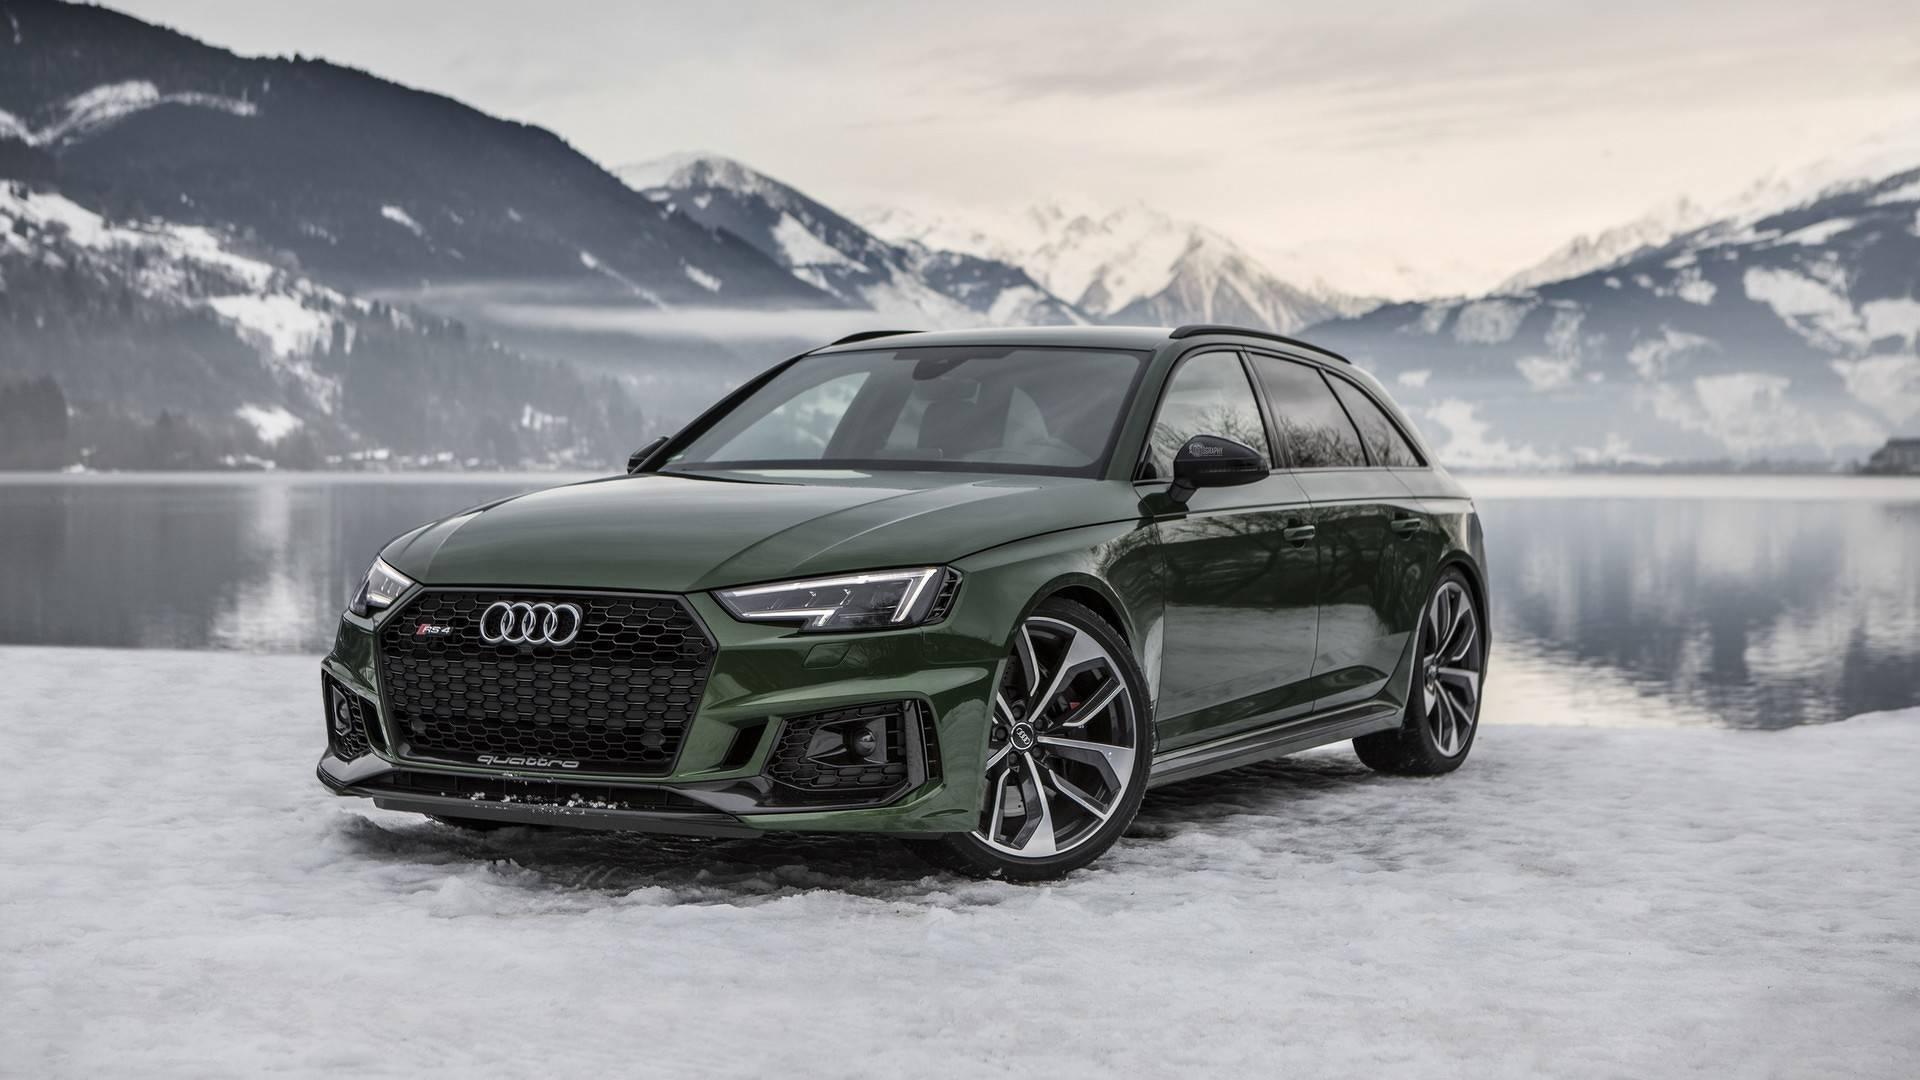 Audi RS Avant Flaunts Sonoma Green Paint In A Winter Wonderland - Audi rs4